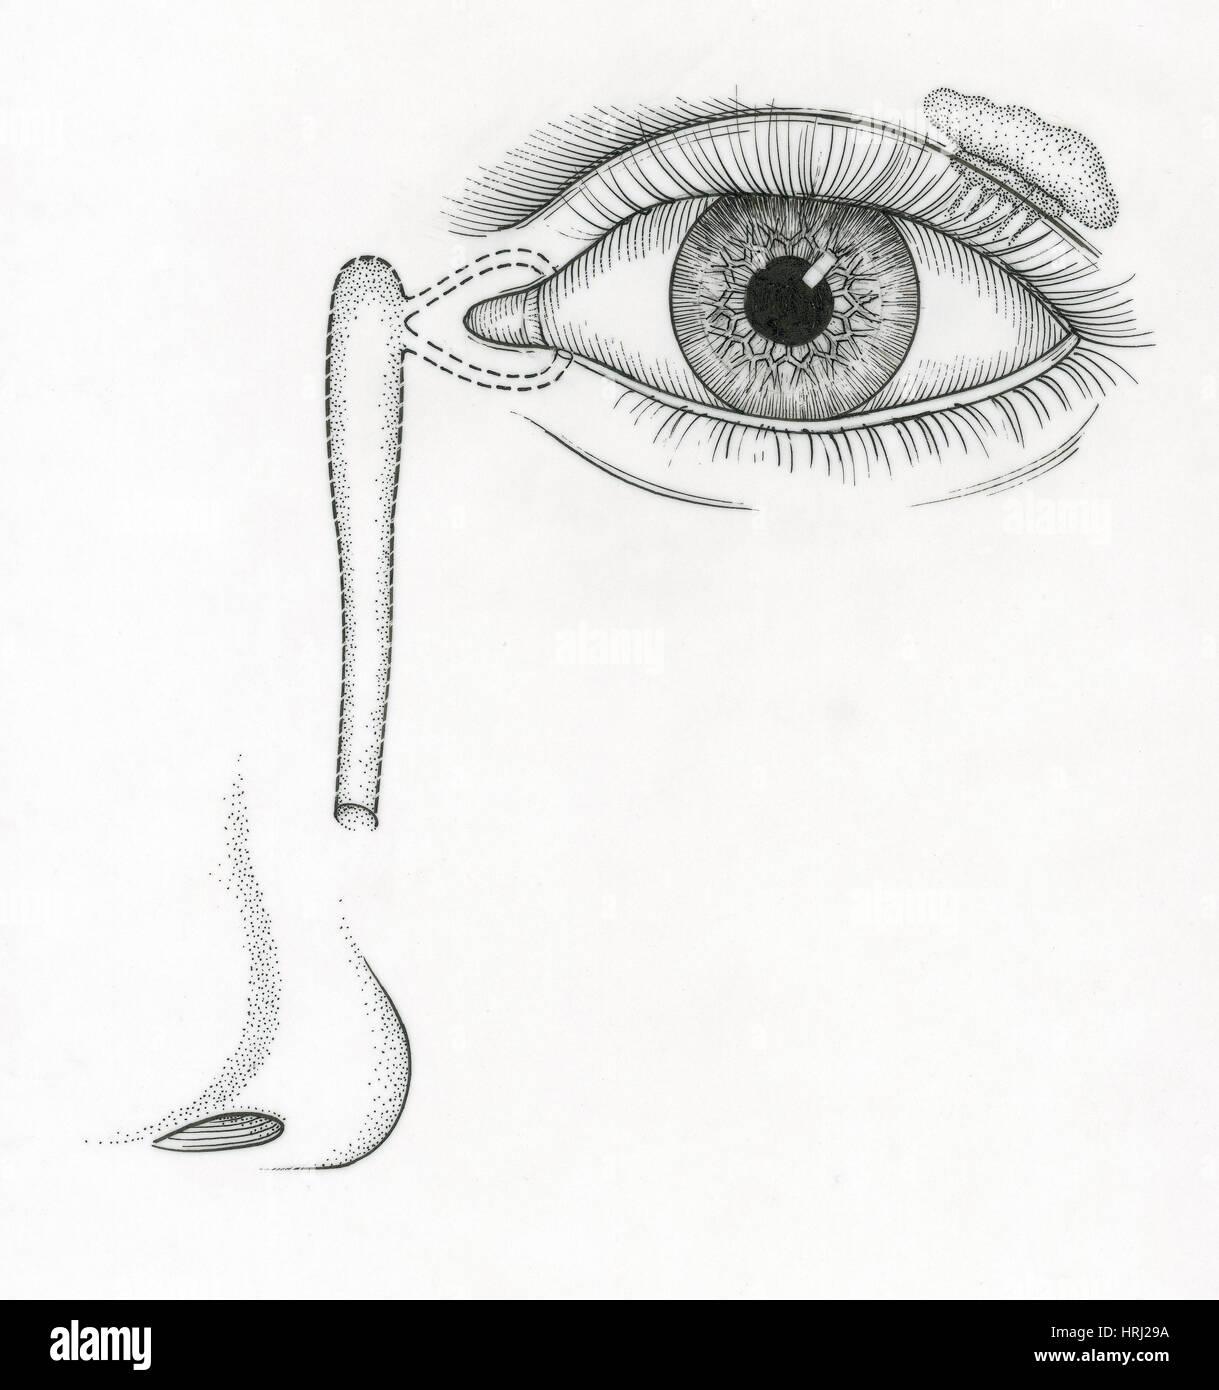 Illustration of Tear Duct Stock Photo: 135006630 - Alamy